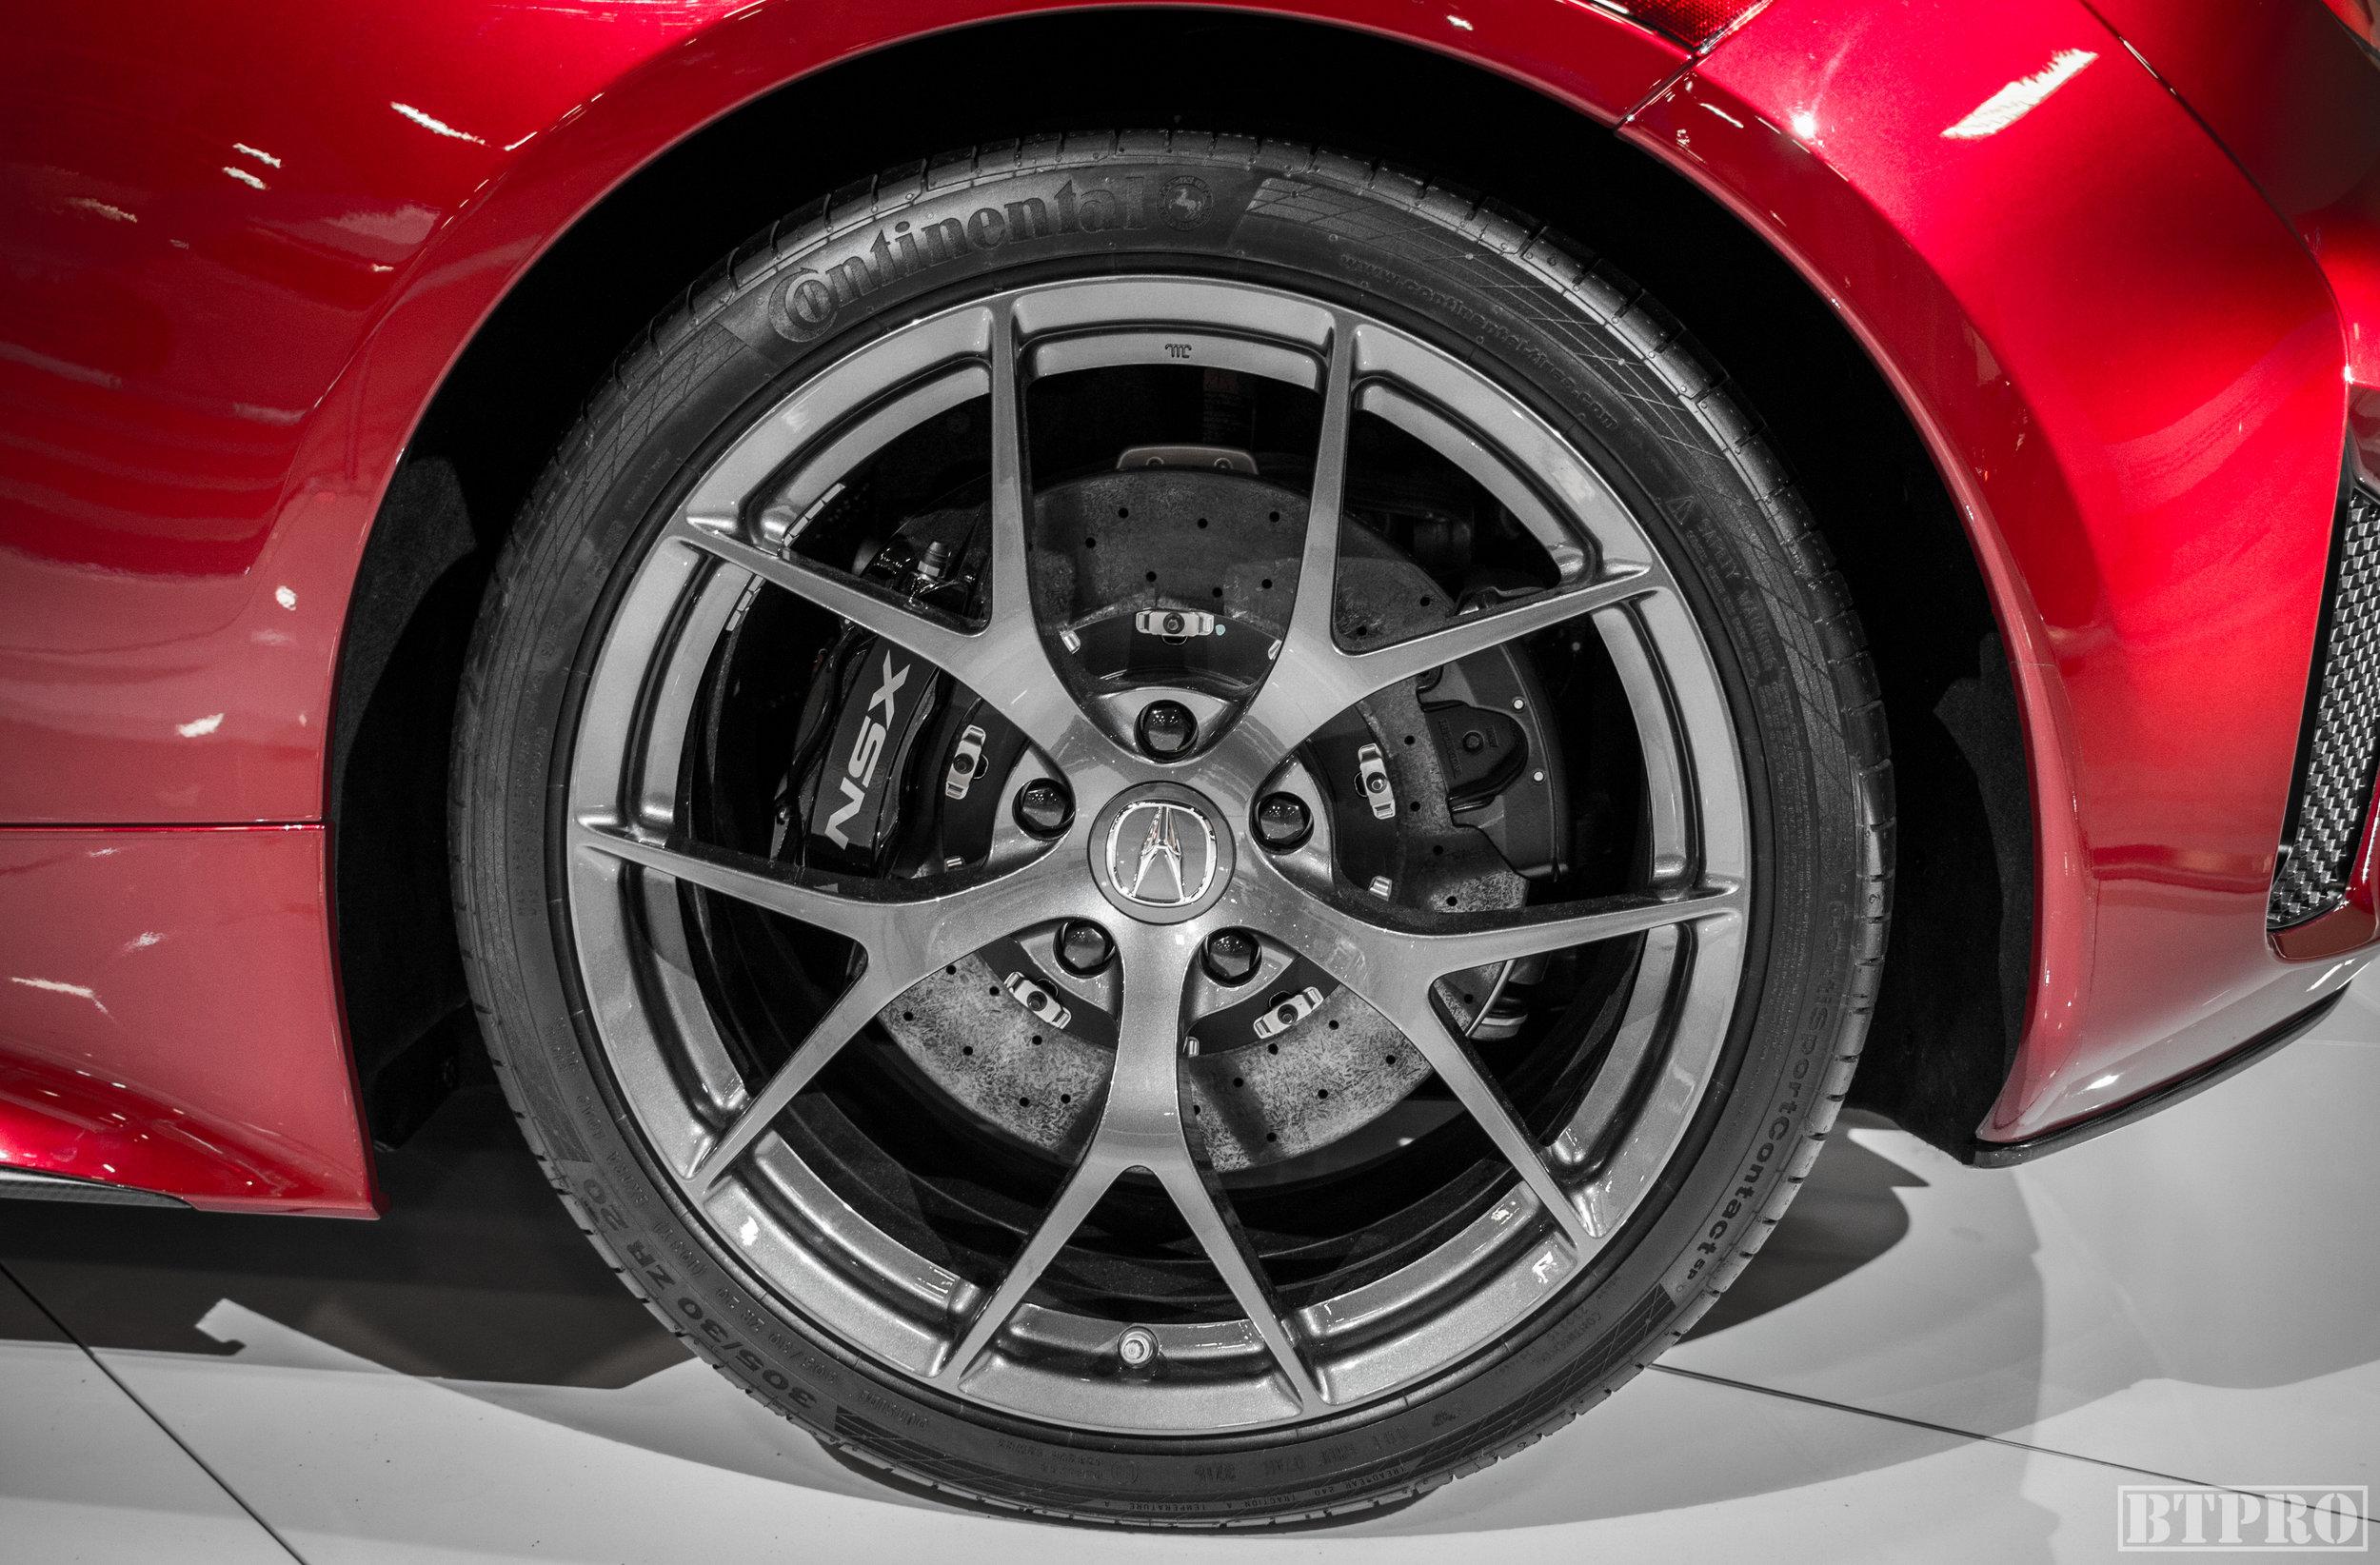 acura, nsx, acura nsx, car show, miami, miami international car show, miami international auto show, auto show, exotic cars, muscle cars, car photography